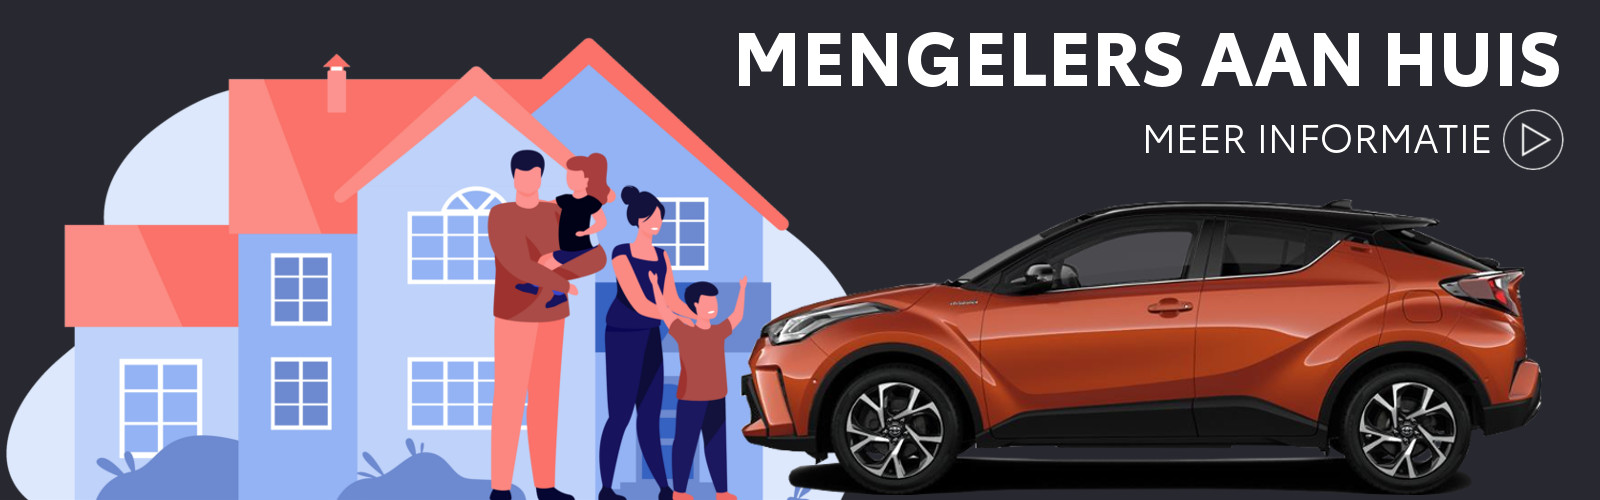 Mengelers-Aan-Huis